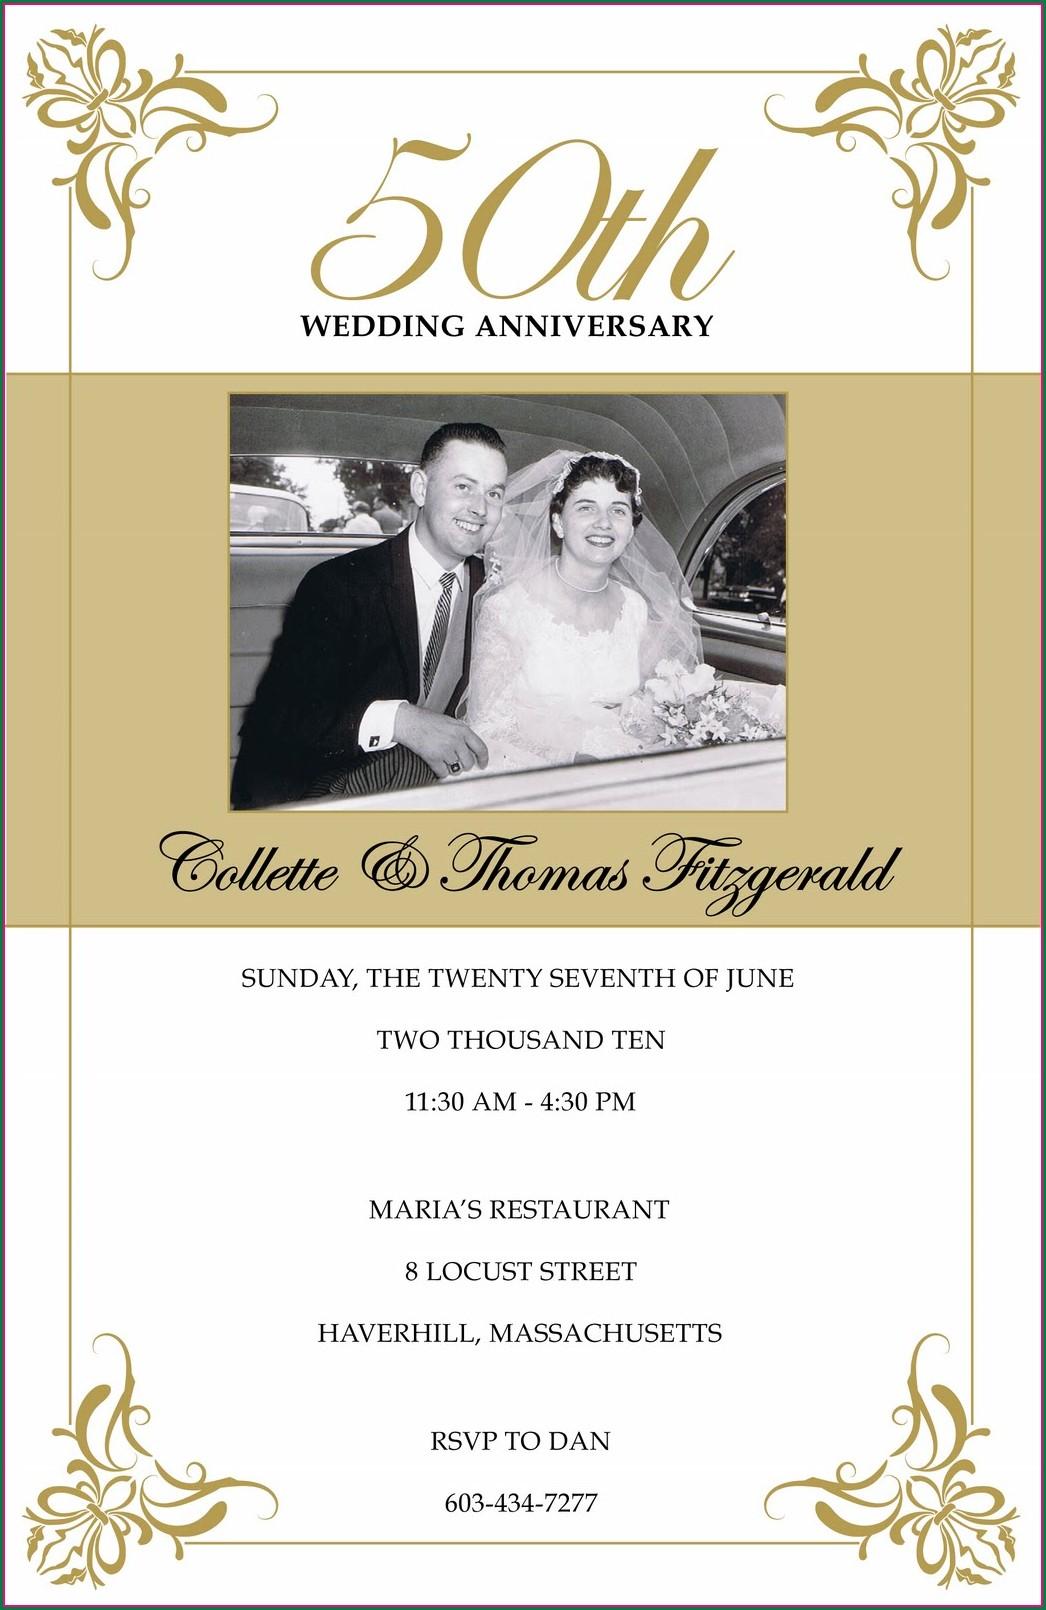 Downloadable Wedding Anniversary Invitation Templates Microsoft Word